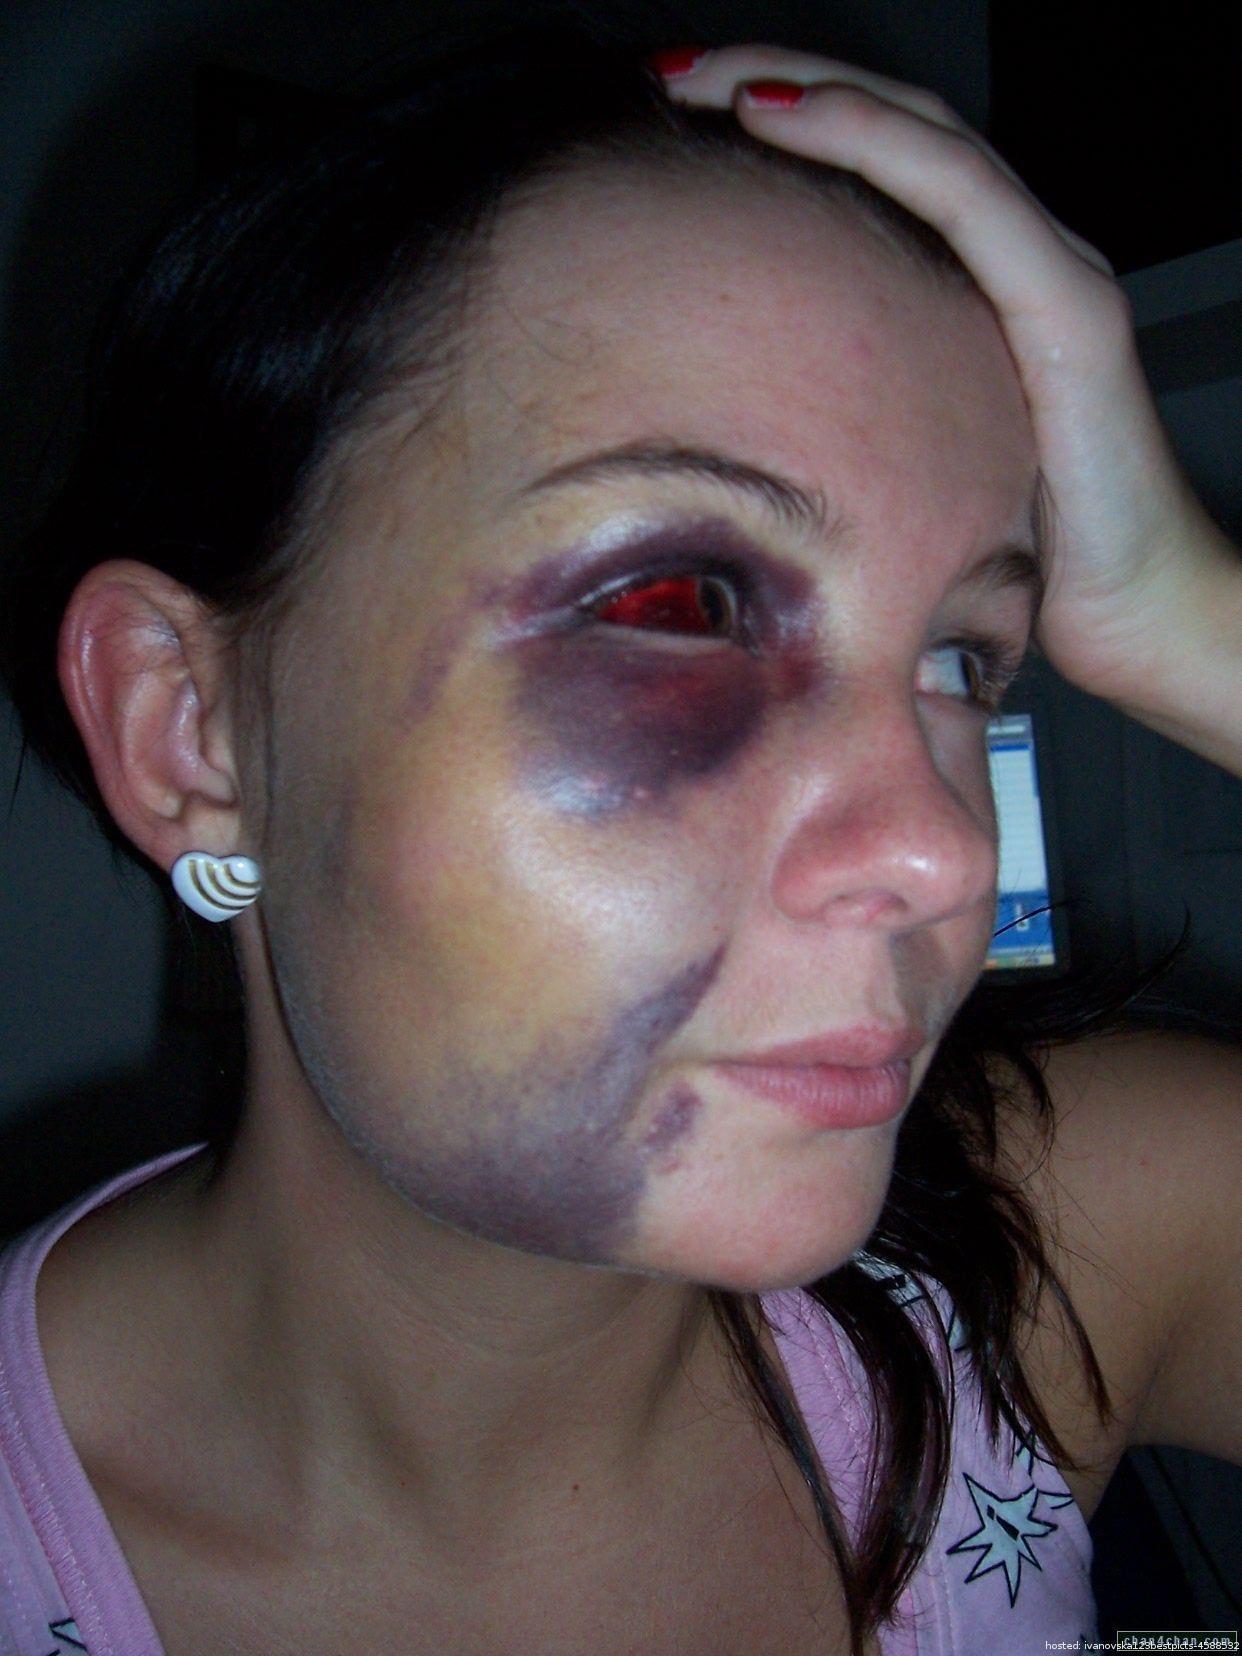 Pregnant Woman Beaten By Her Boyfriend  Pinterest -4678